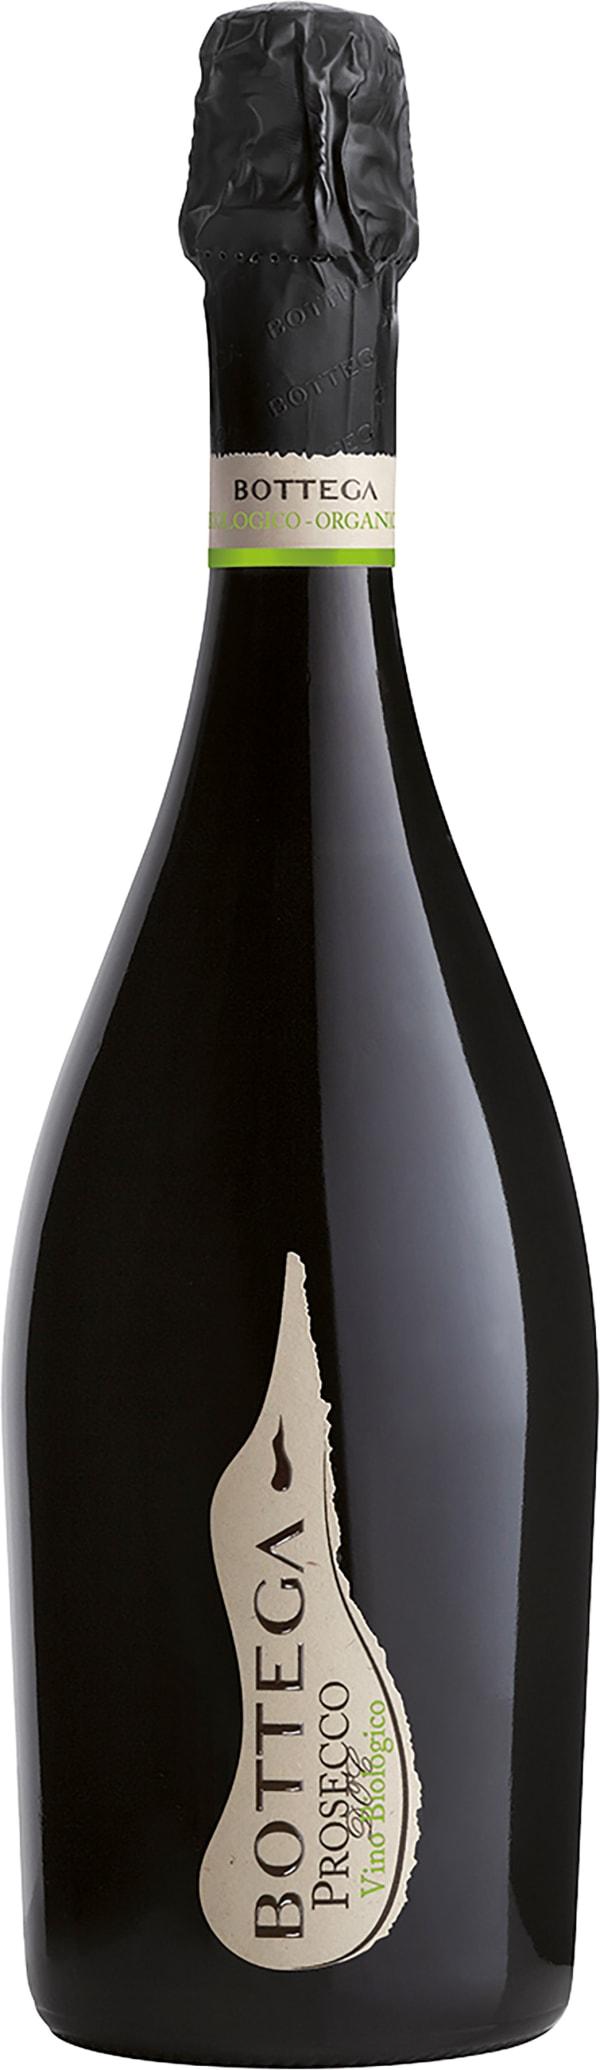 Bottega Vino Biologico Prosecco Extra dry